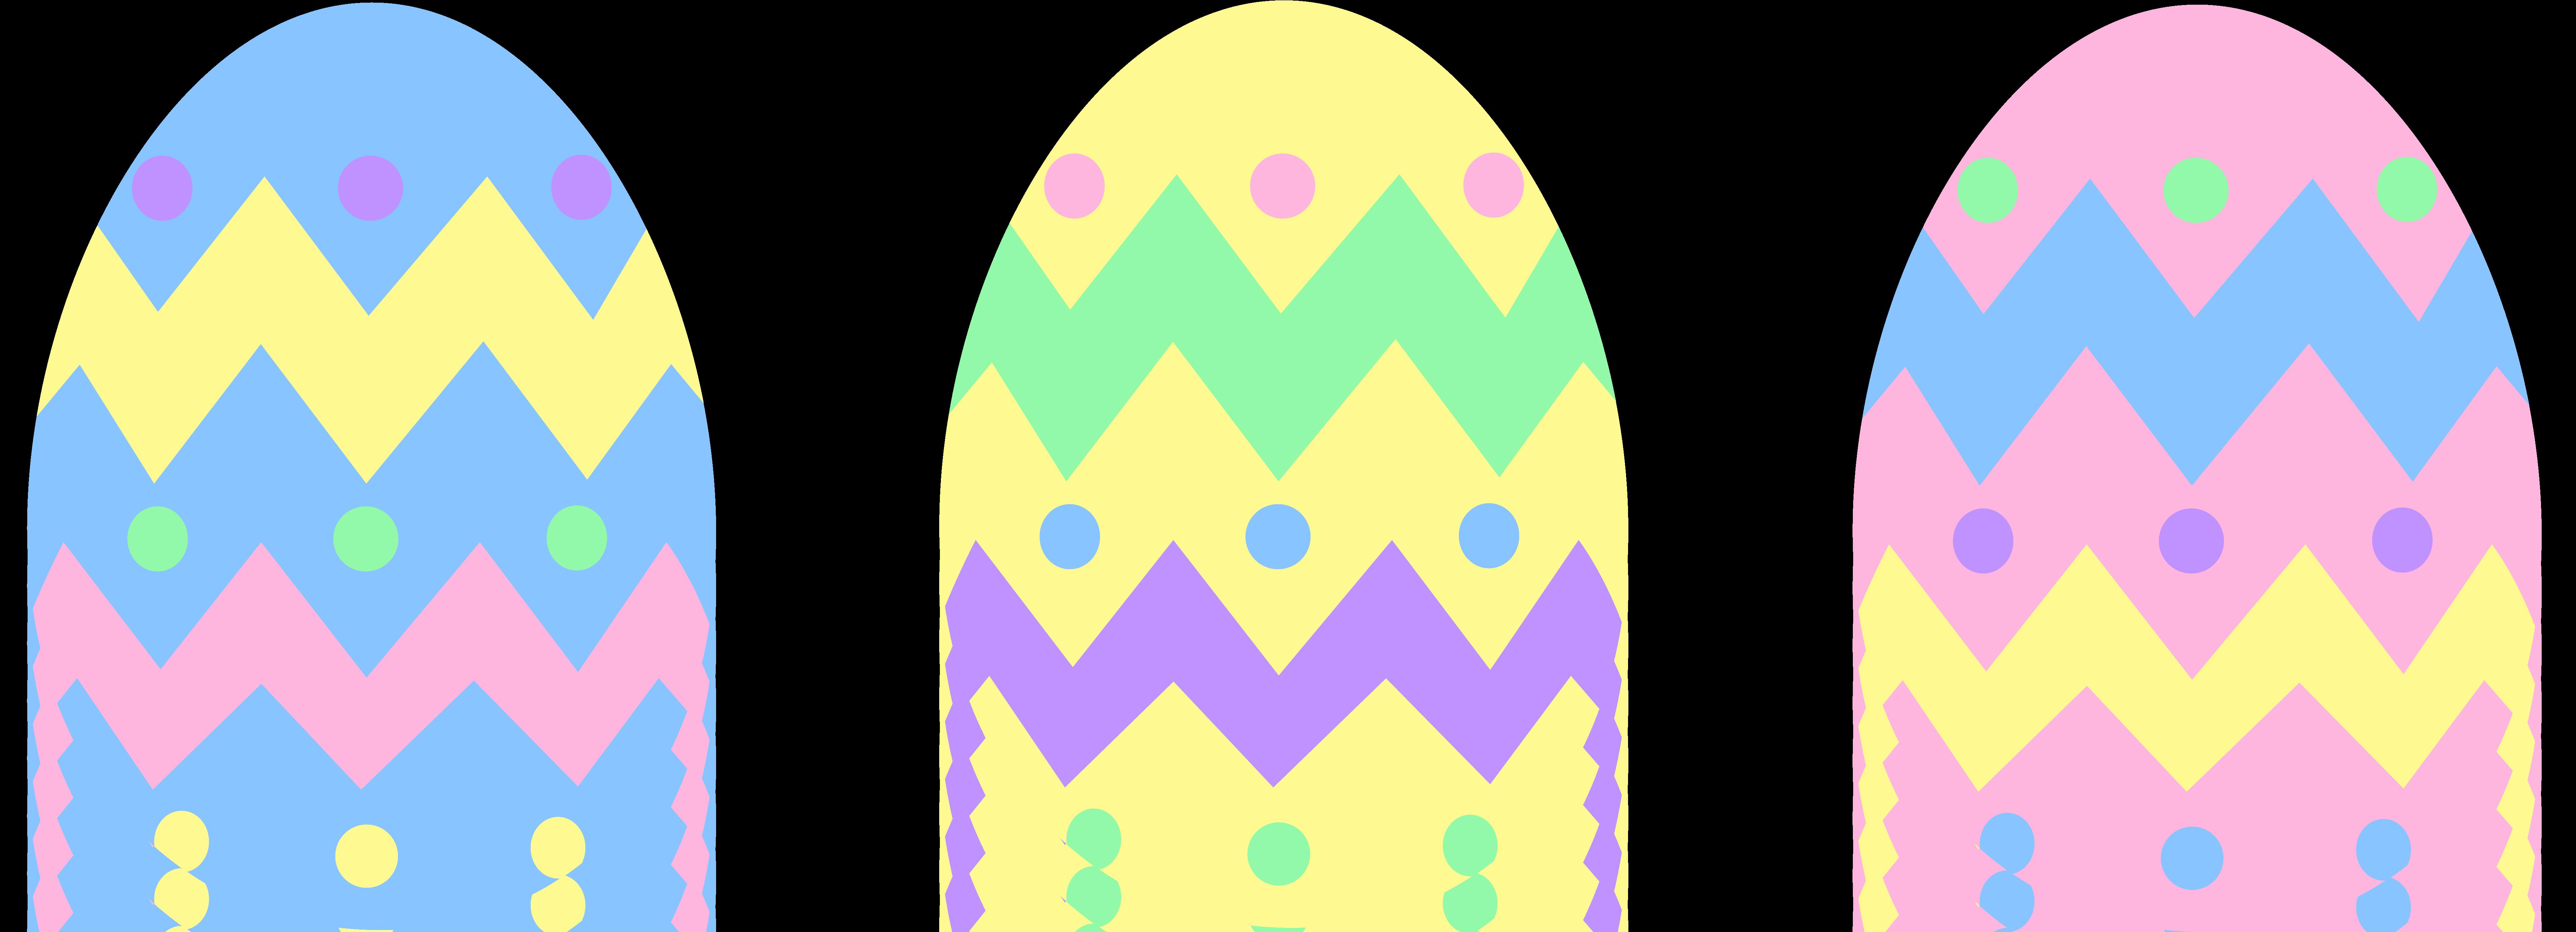 7655x2769 Top 81 Easter Eggs Clip Art